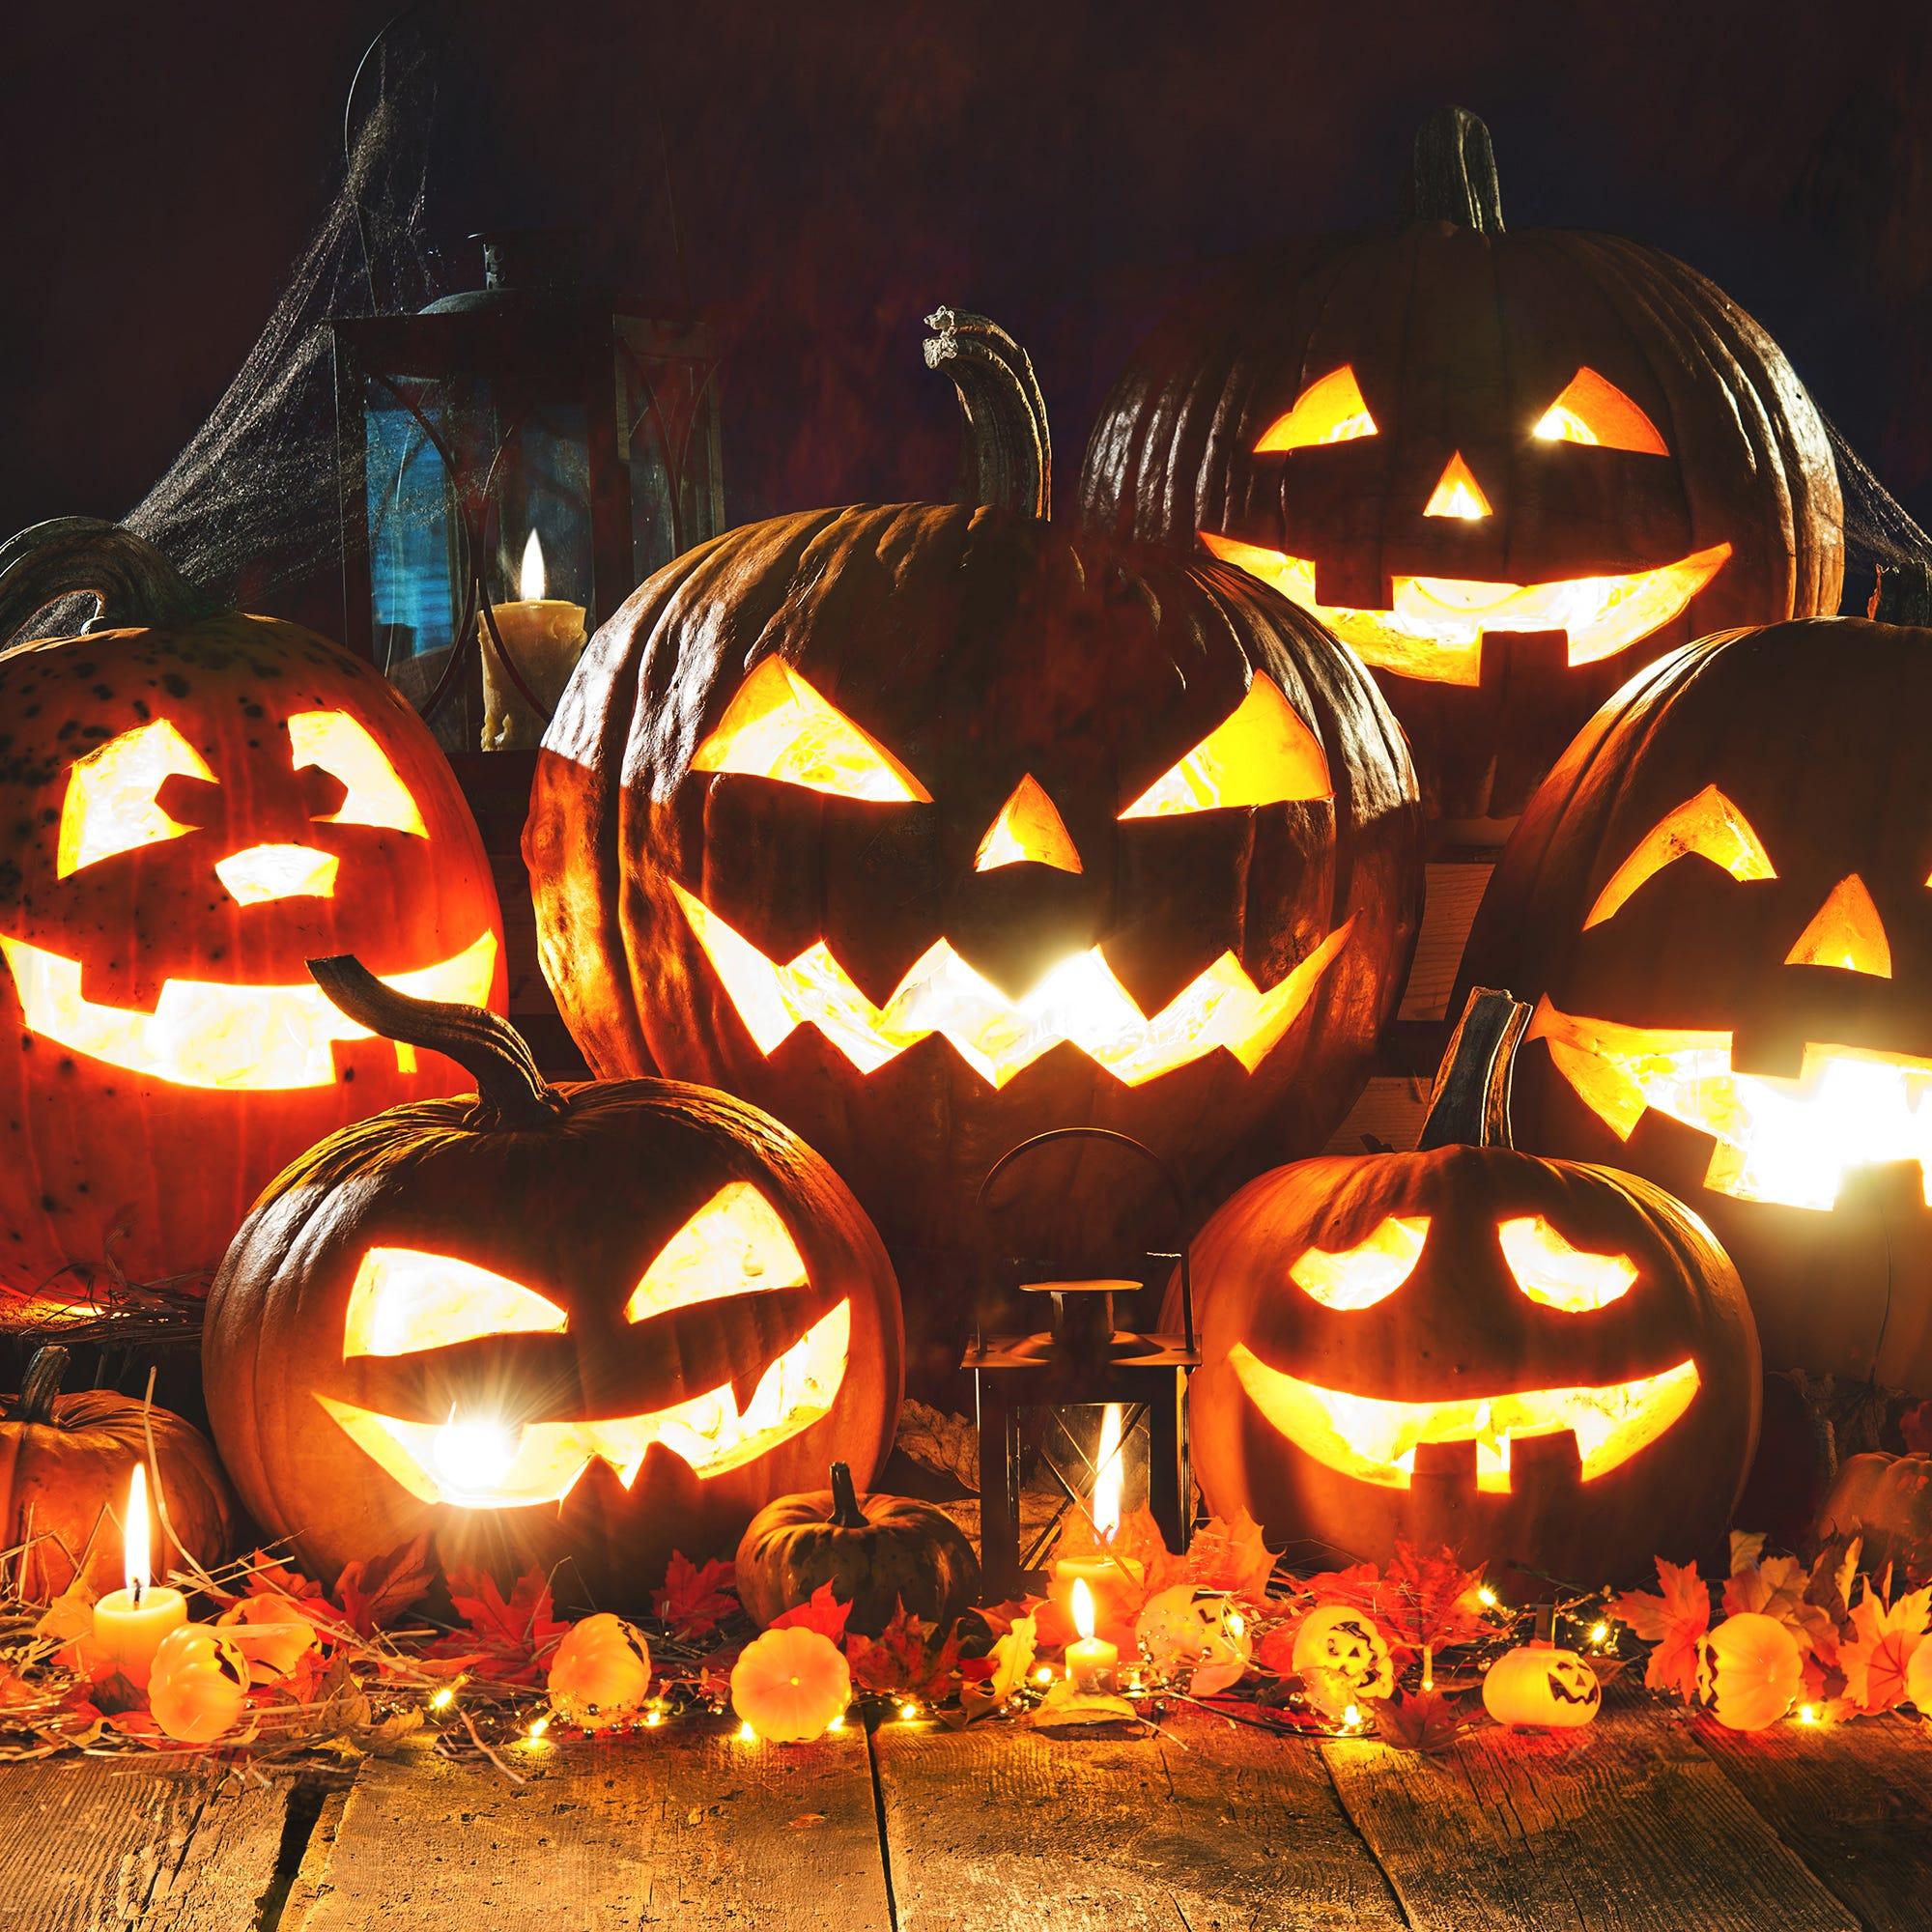 Uncategorized Origin Of Jack O Lantern jack o lantern halloween pumpkin carving irish legend